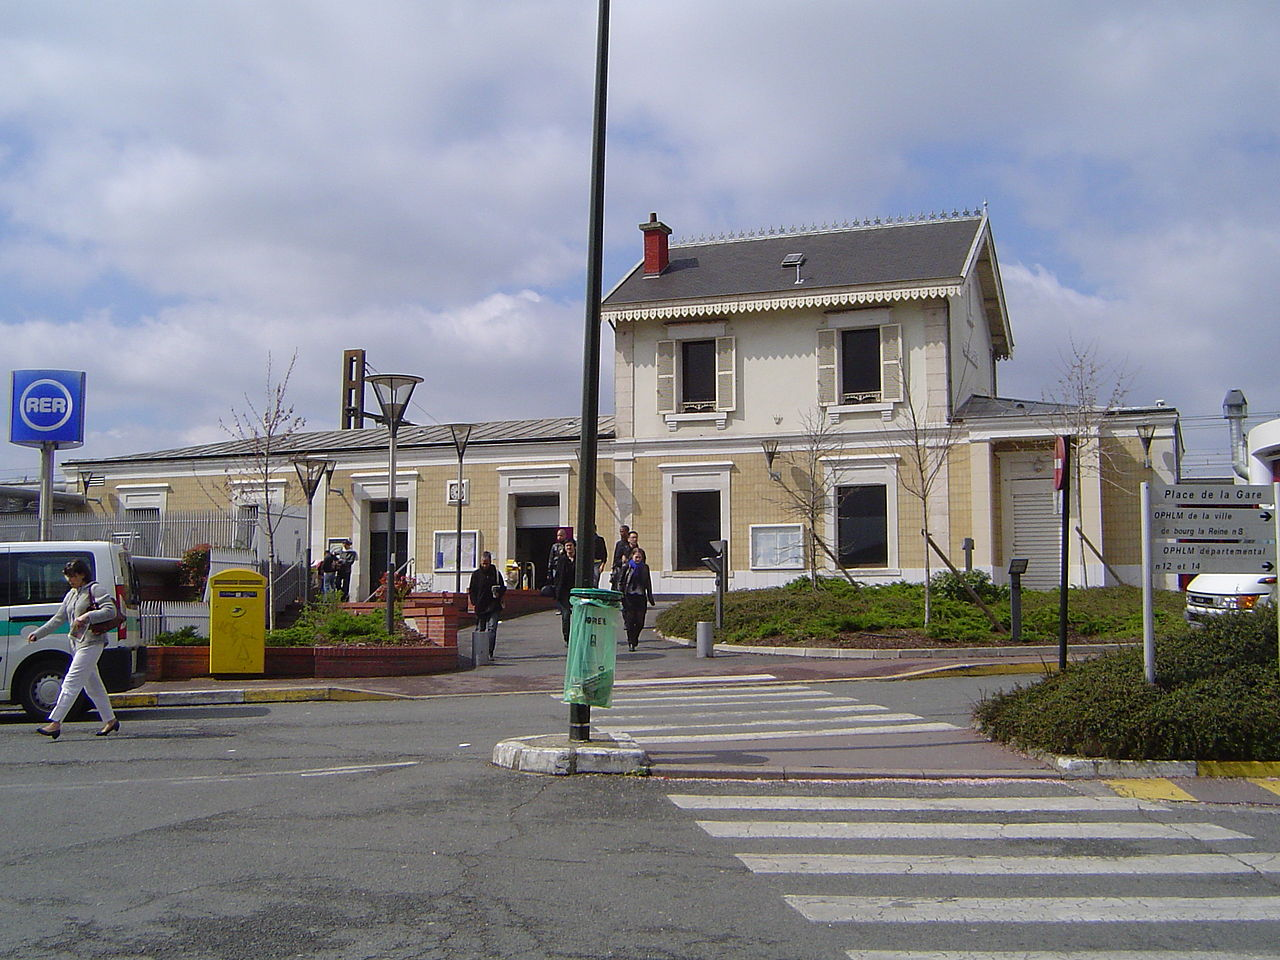 Fichier bourg la reine gare du rer 1 jpg wikip dia - Monoprix bourg la reine ...